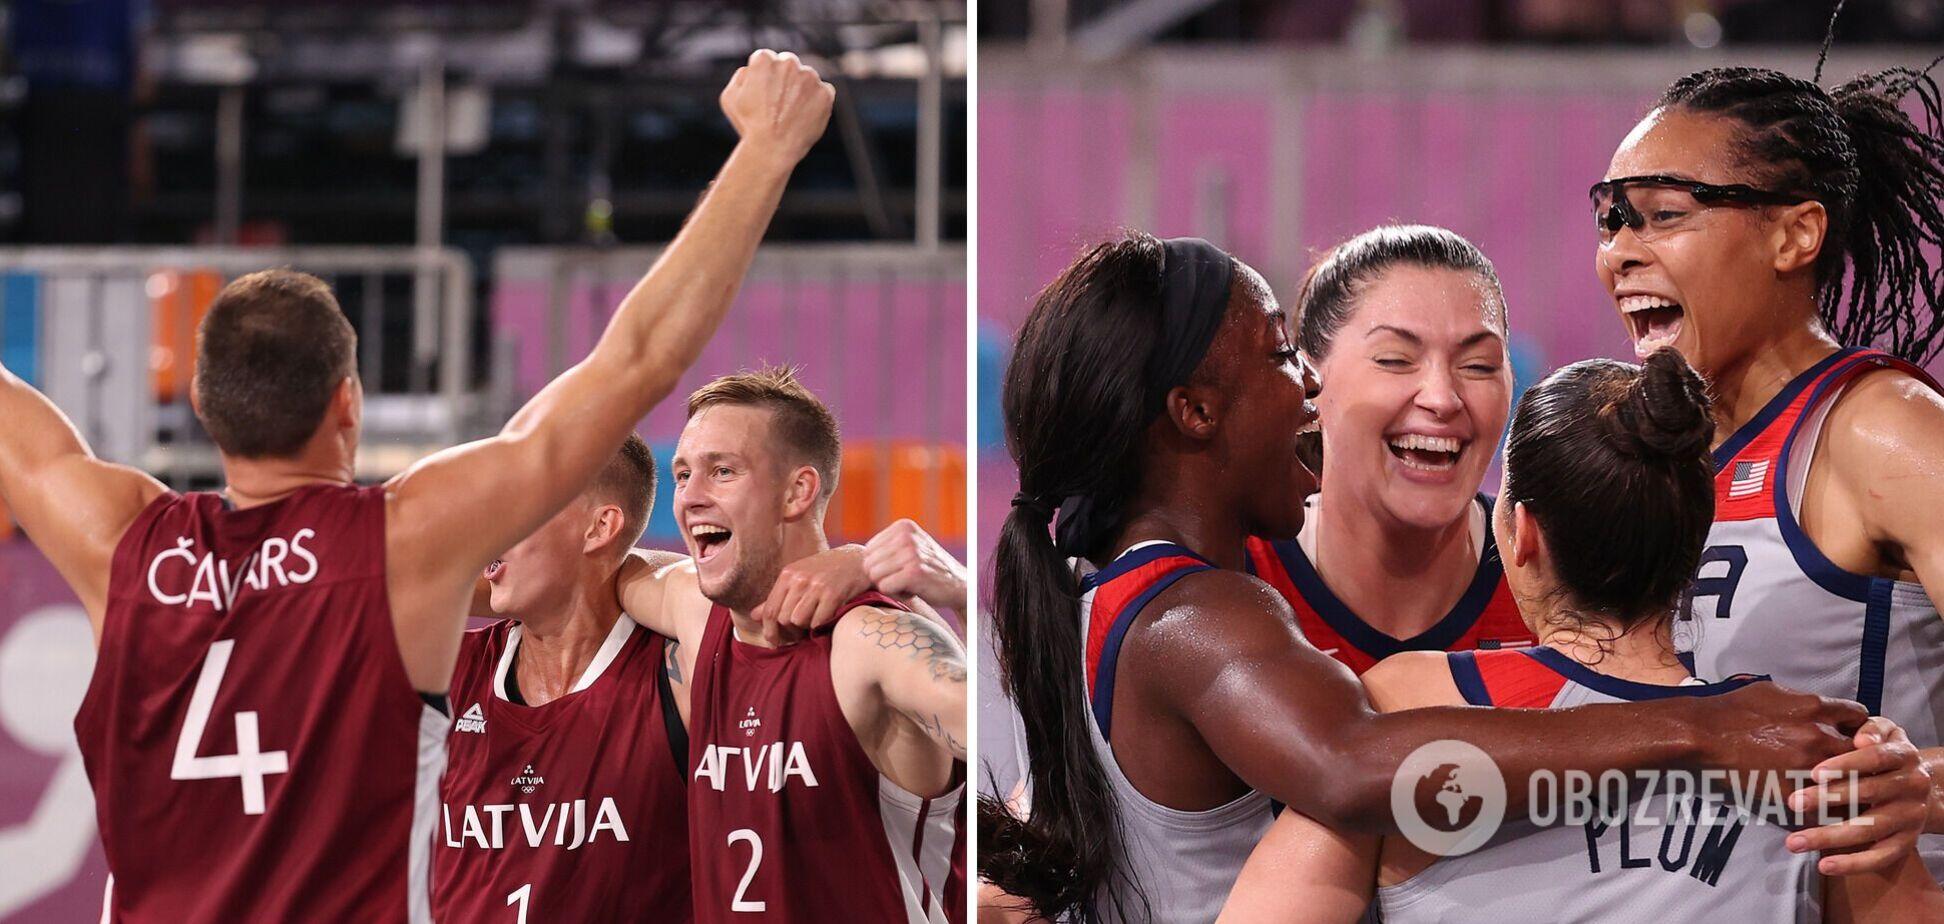 Кто выиграл Олимпиаду в Токио по баскетболу 3х3